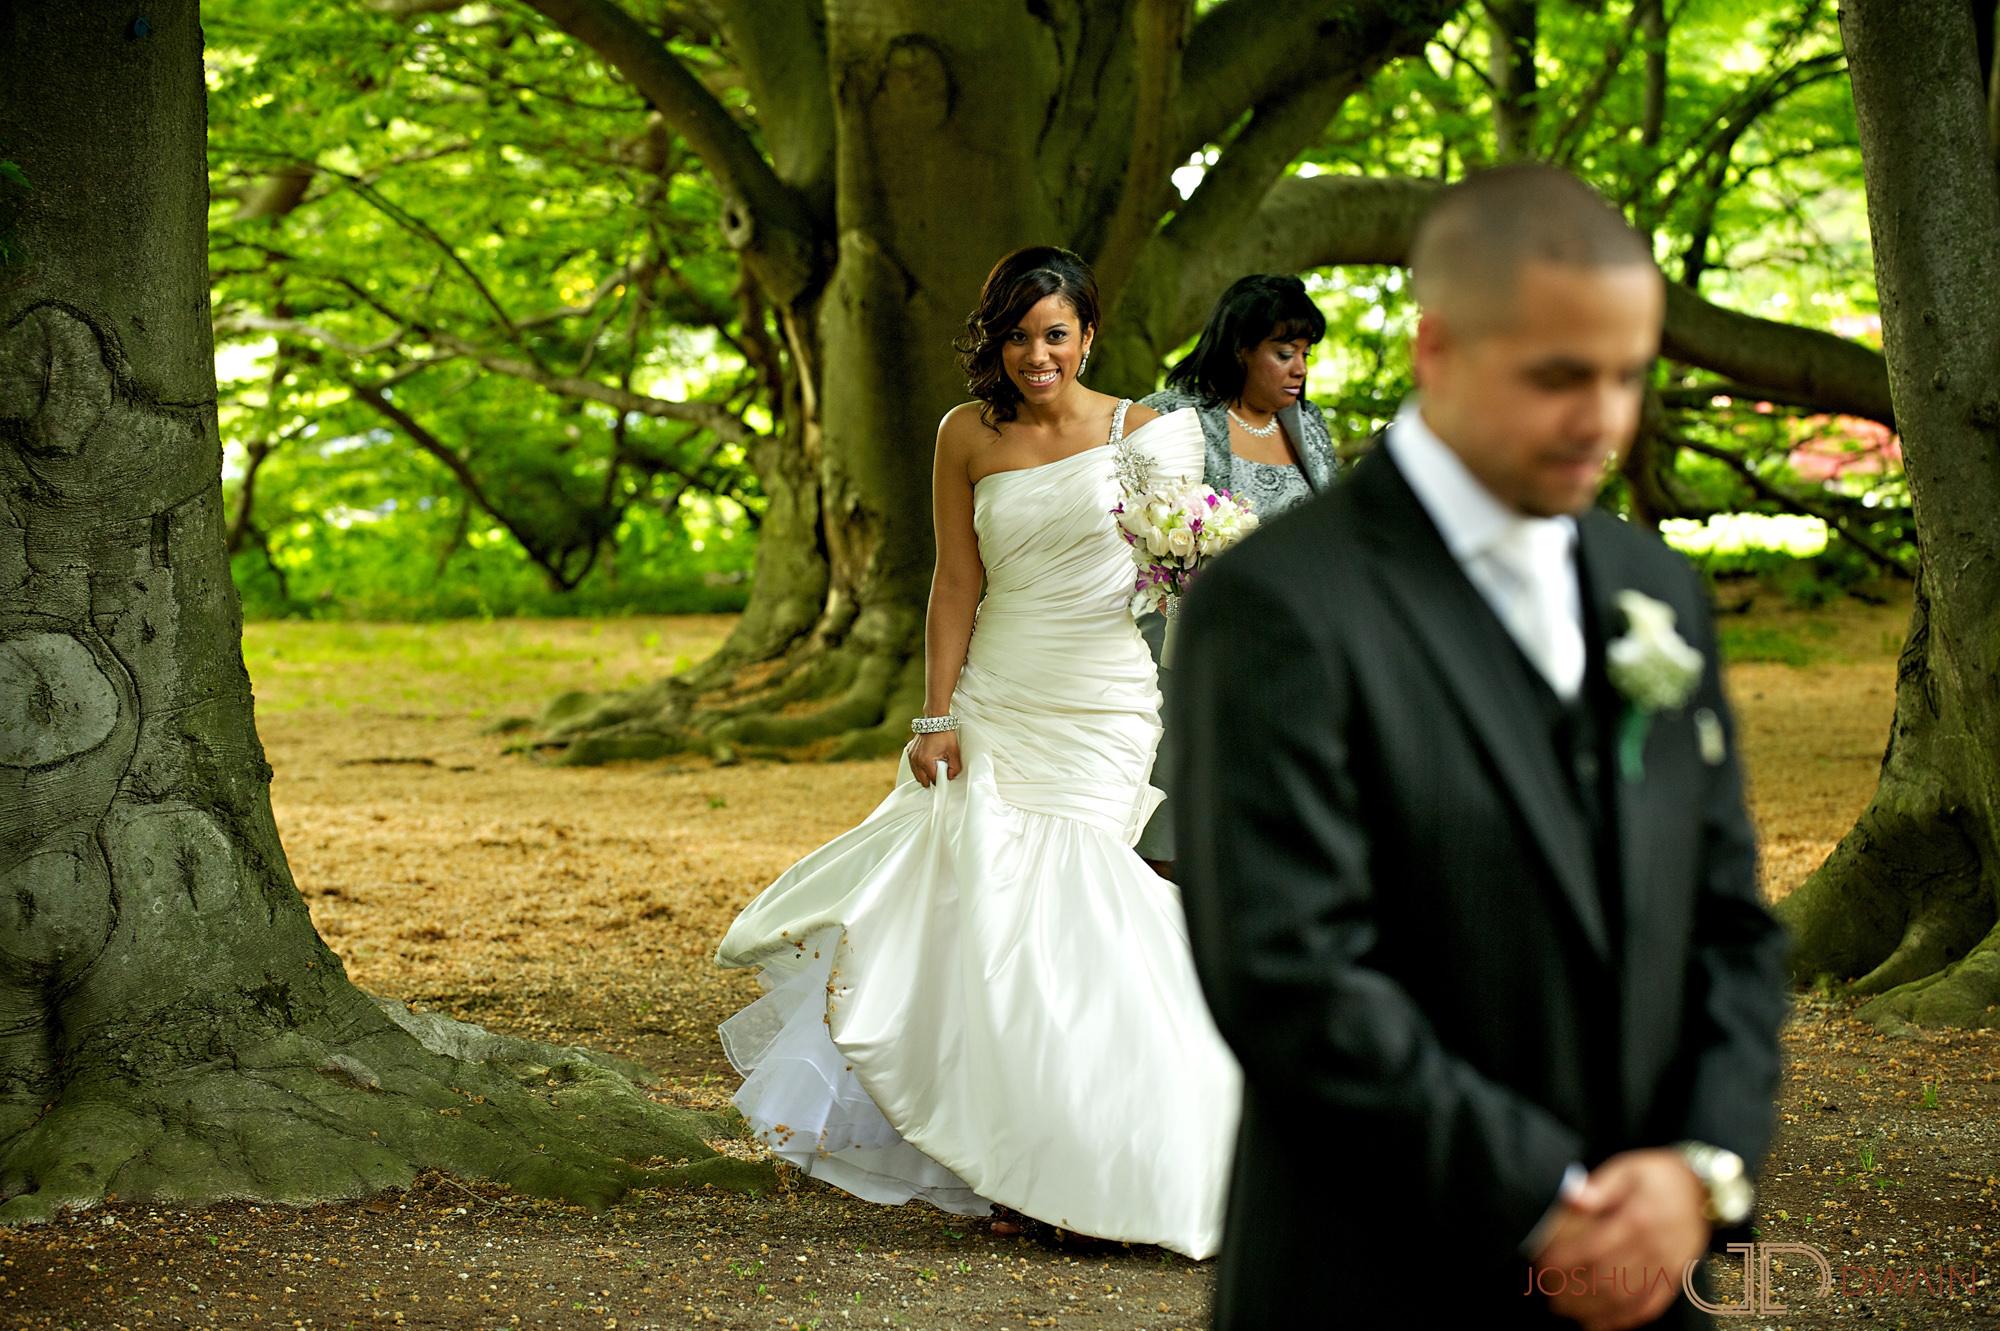 carolina-hector-007-chateau-briandlong-island-new-york-wedding-photographer-joshua-dwain-2011-05-13_ch_0330